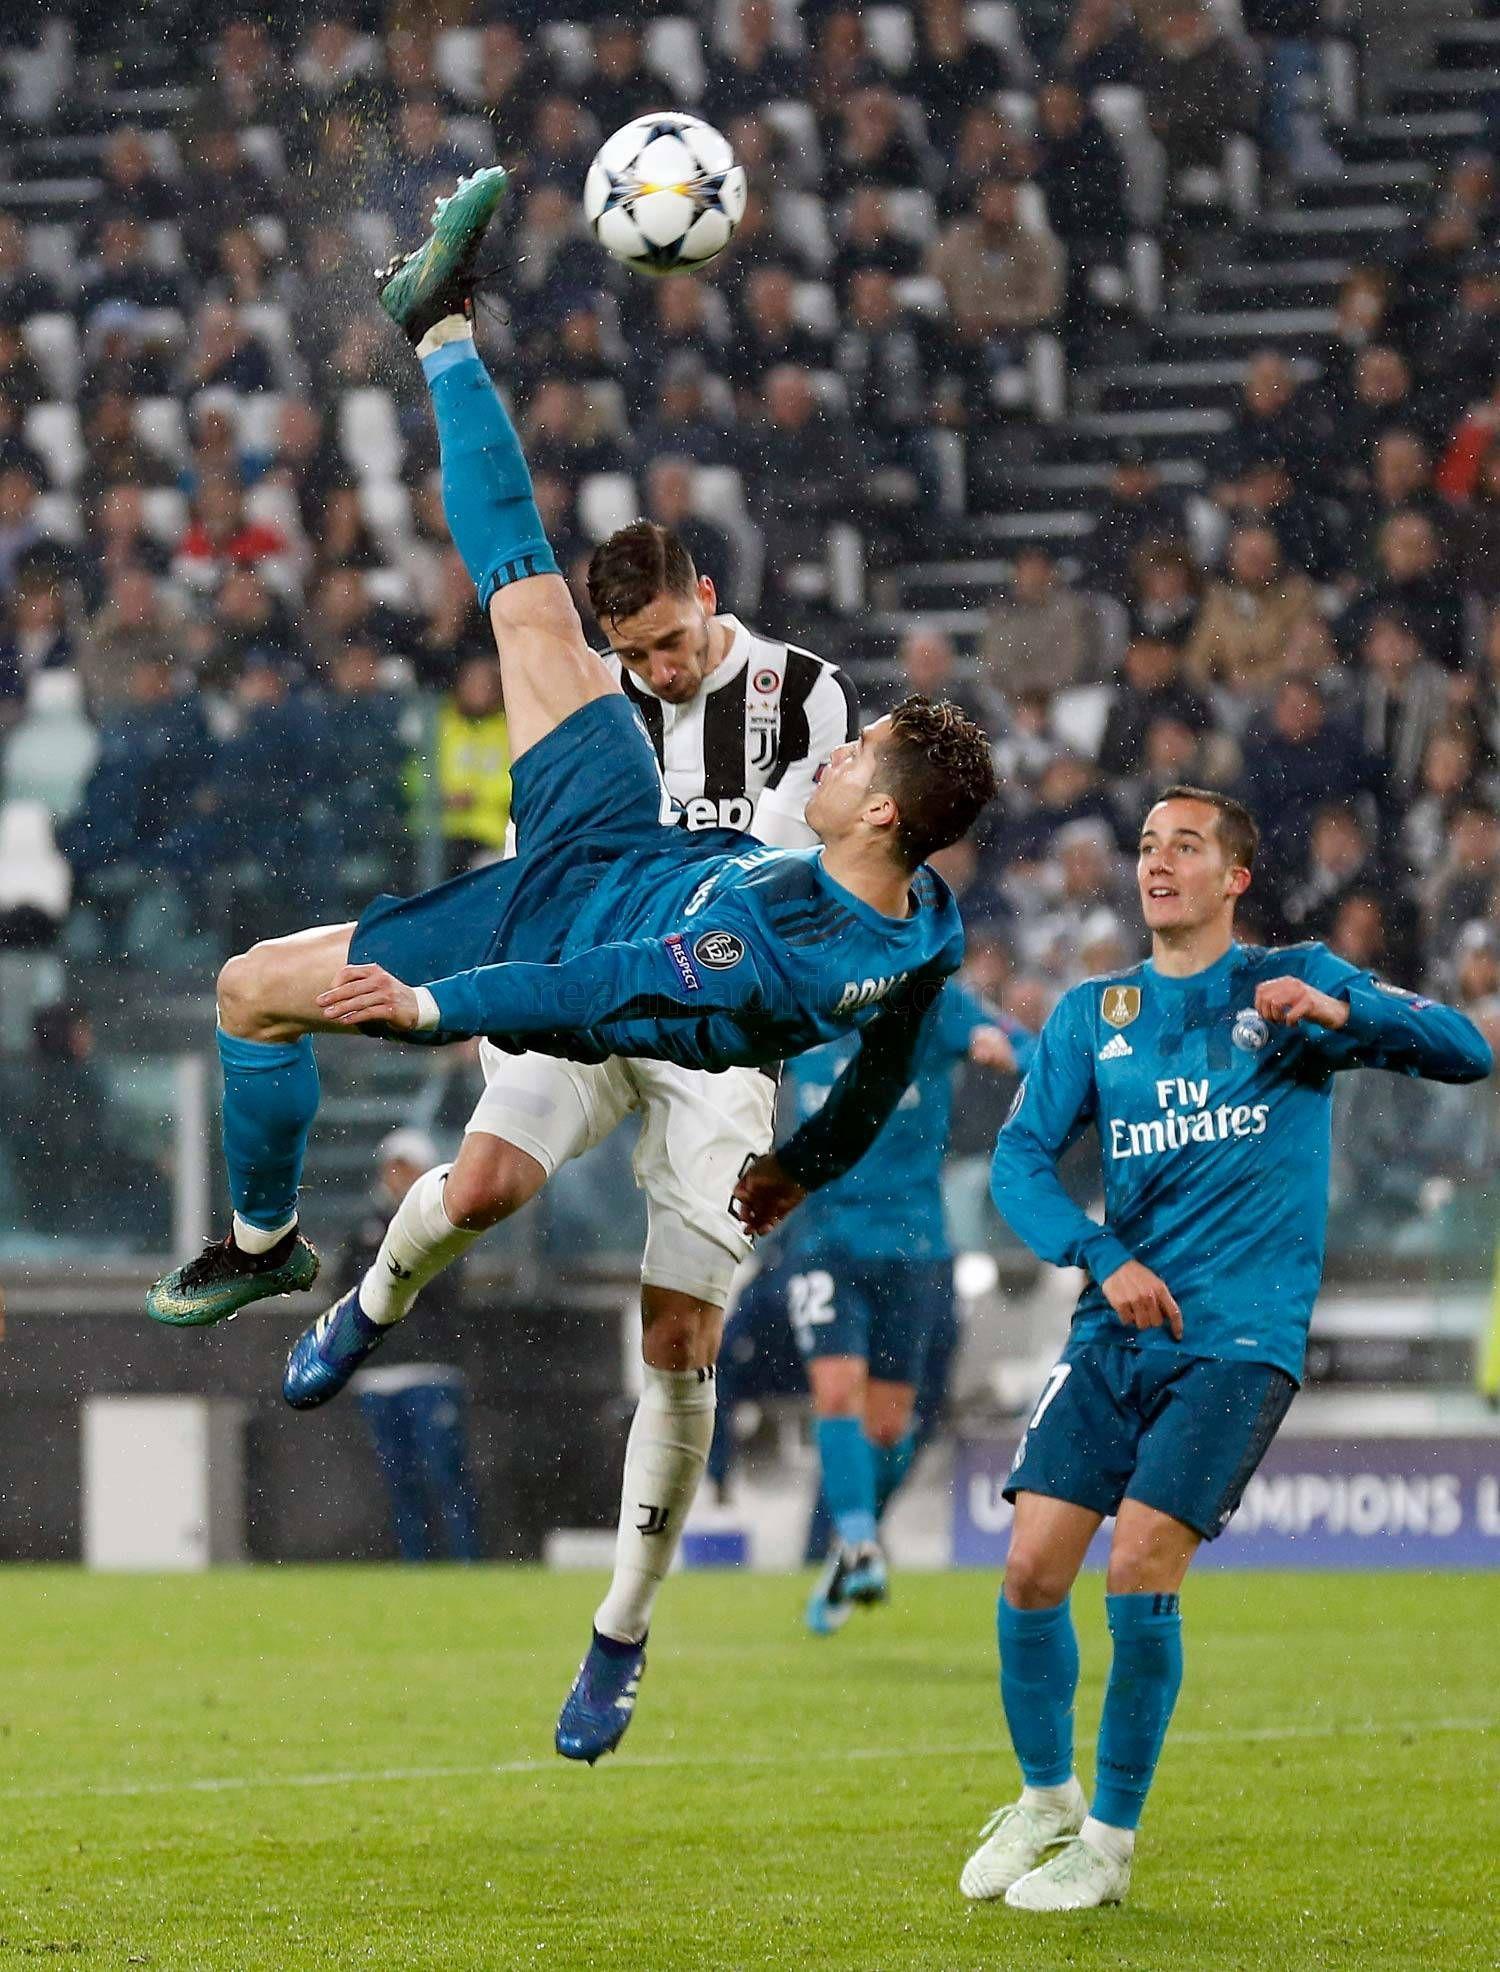 aa607b4d85 Cr7 Juventus, Cristiano Ronaldo Juventus, Cristiano Ronaldo Wallpapers, Cr7  Ronaldo, Juventus Players